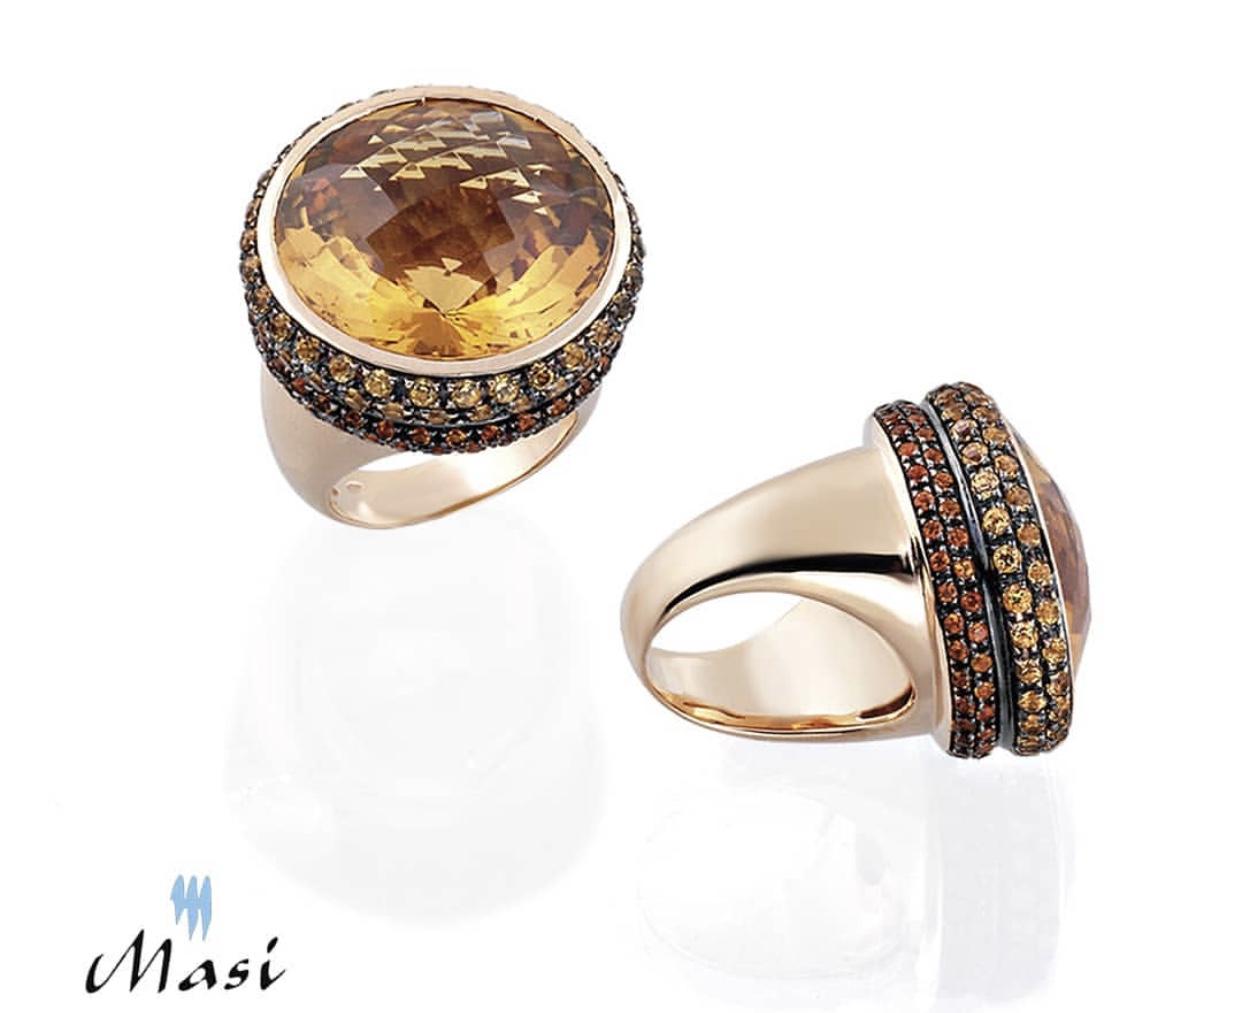 Masi_Gioielli_mandarin_garnet_citrine_ring